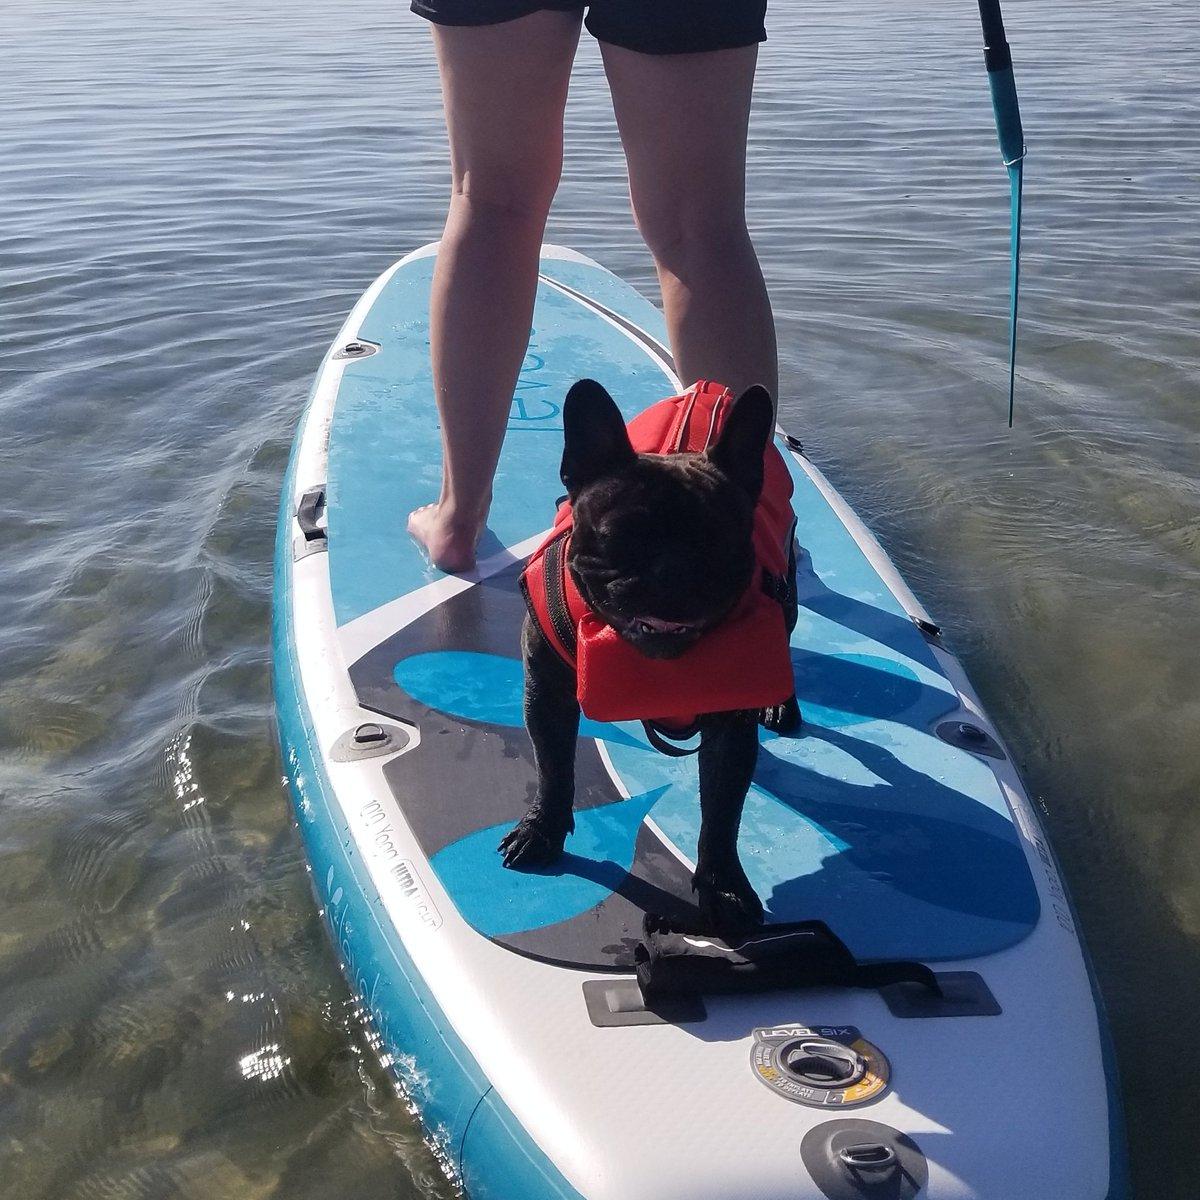 Ready to go!!  #kona #paddleboarding #lakelife #summertime #frenchiespic.twitter.com/E9Bh2m0QWI